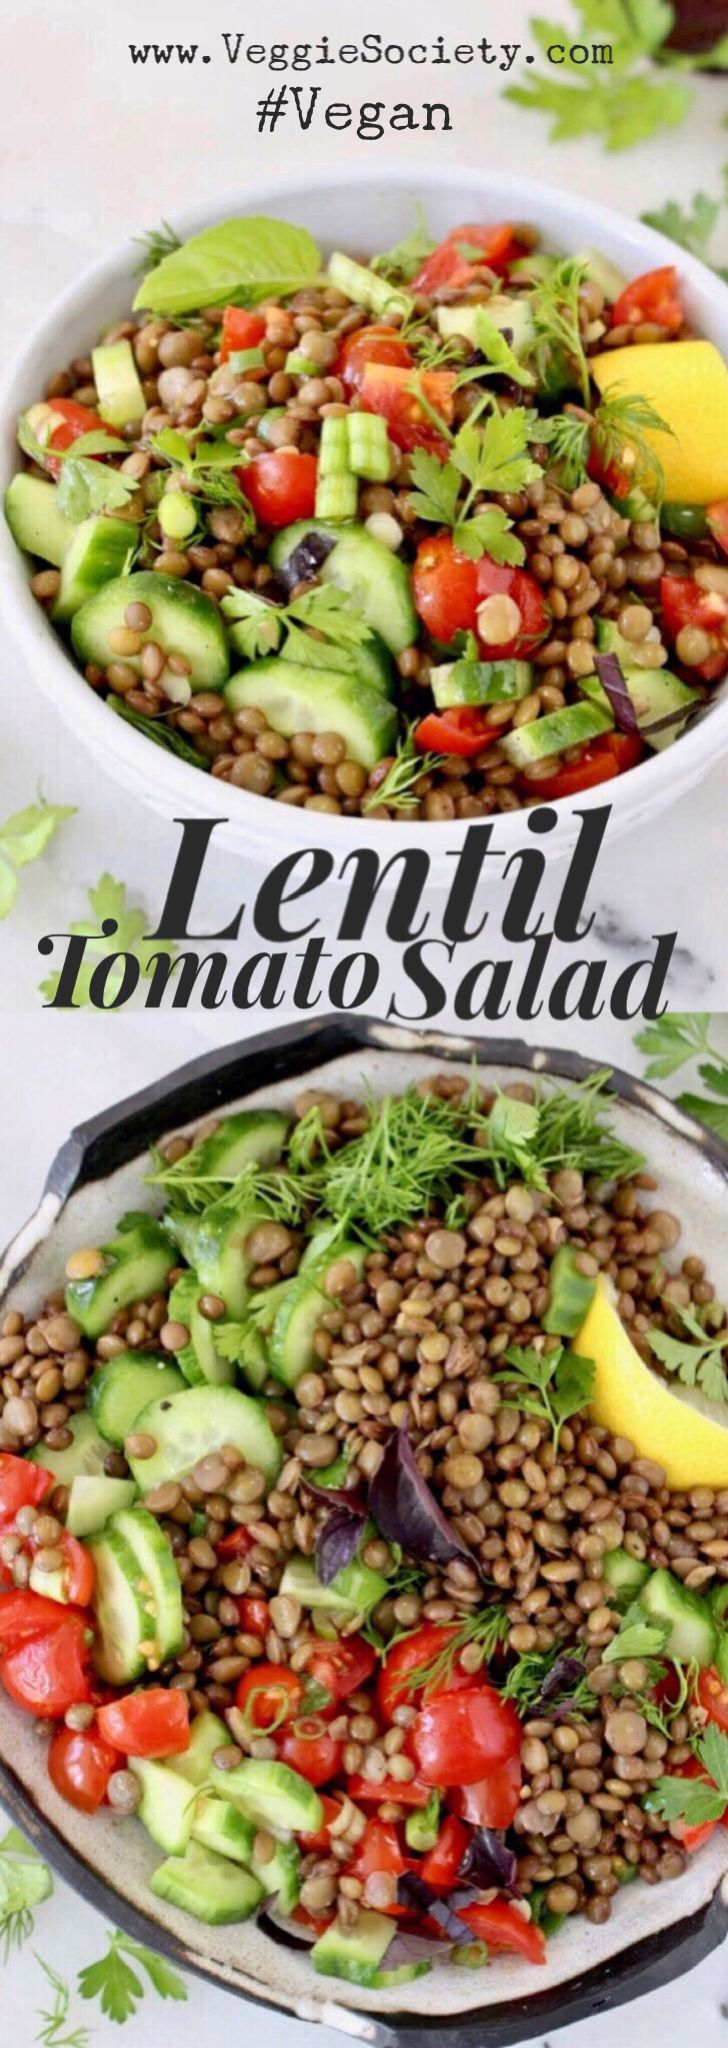 Cucumber Tomato Lentil Salad Recipe with Lemon Dressing, Dill, Basil and Parsley. Easy, Healthy, Vegan   VeggieSociety.com ⭐️ ⭐️ ⭐️ ⭐️ ⭐️ #vegan #plantbased #lentils